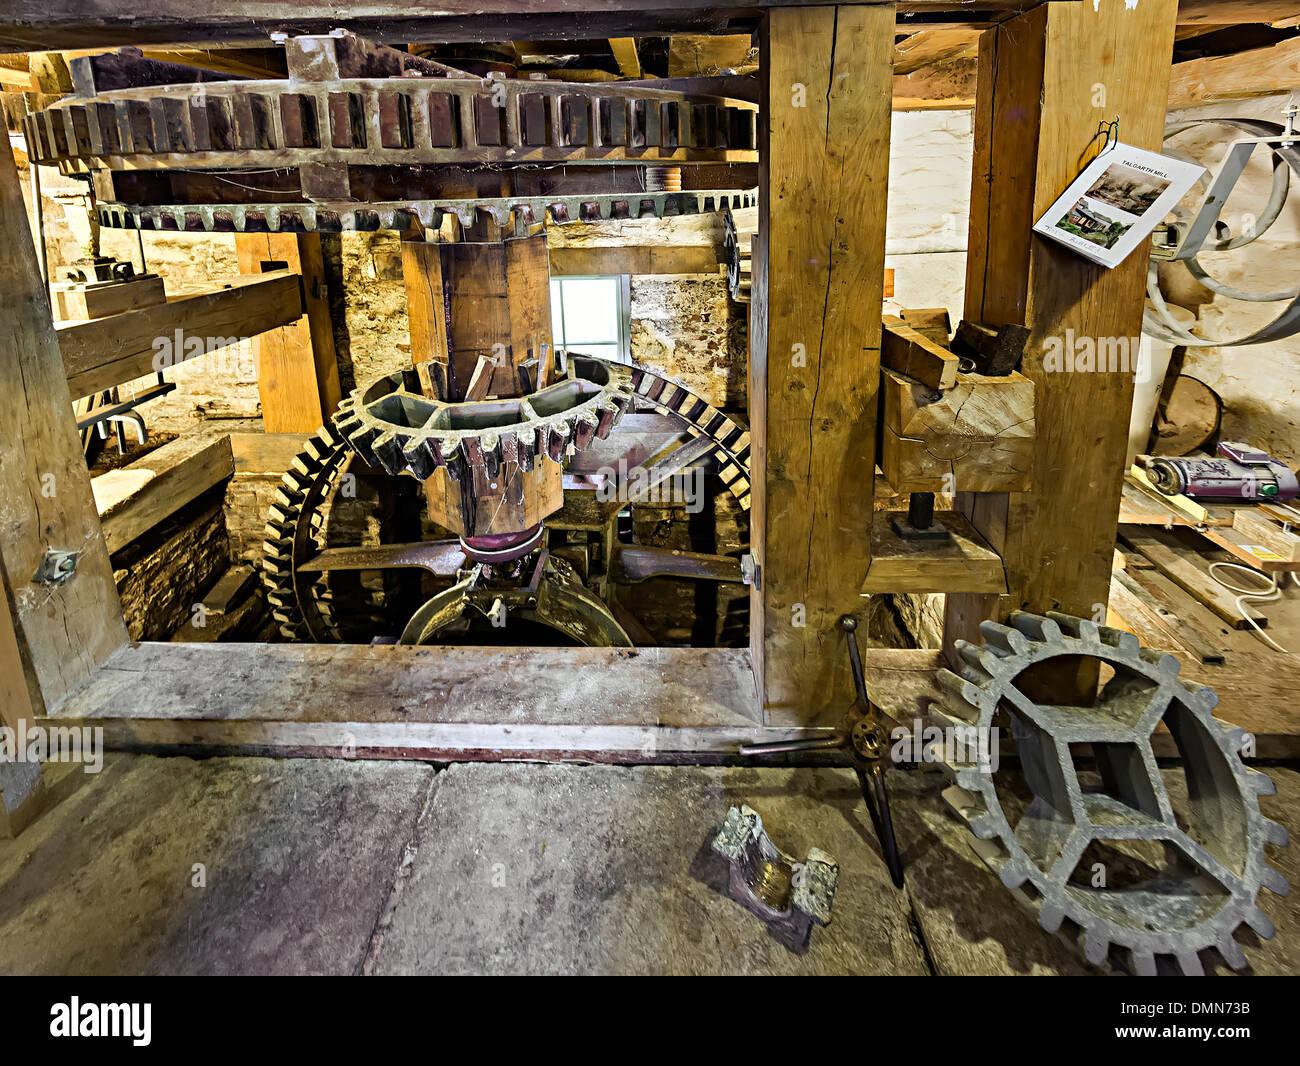 Water powered mill gears, Talgarth, Powys, Wales, UK - Stock Image